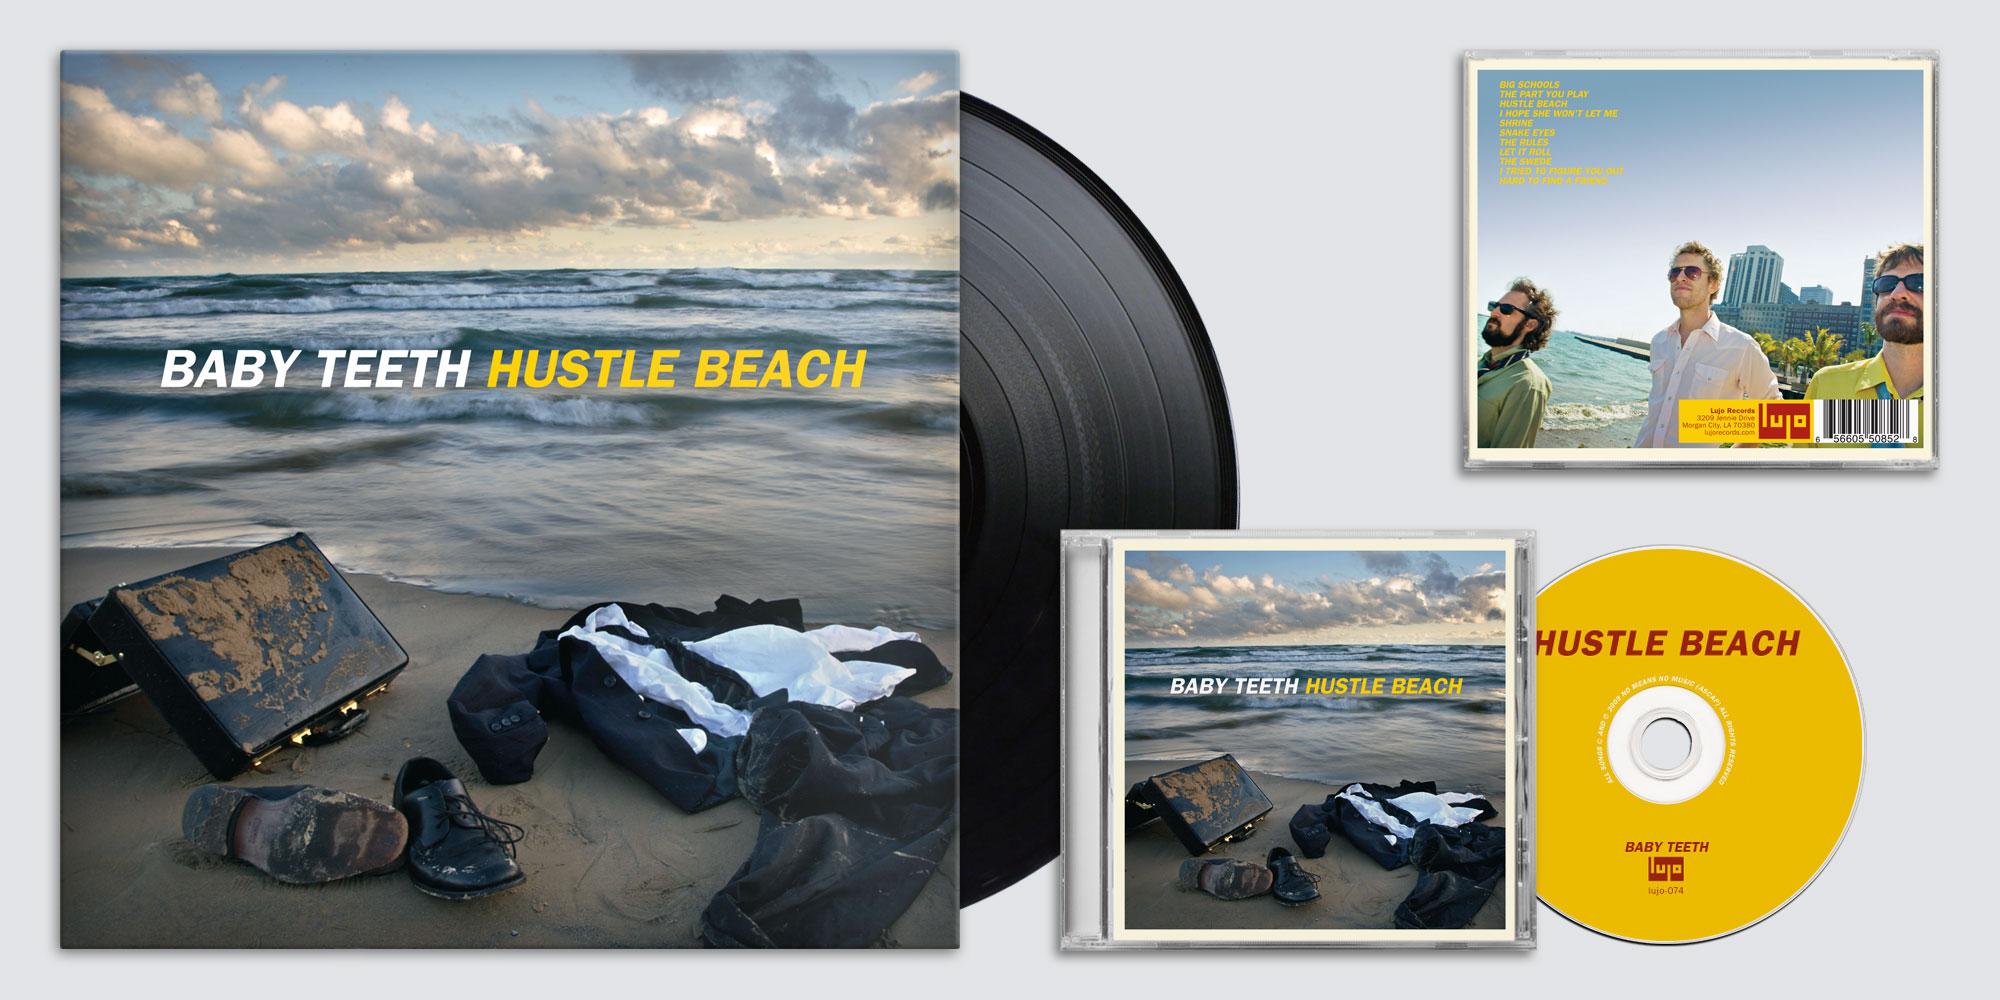 music_hustlebeach.jpg